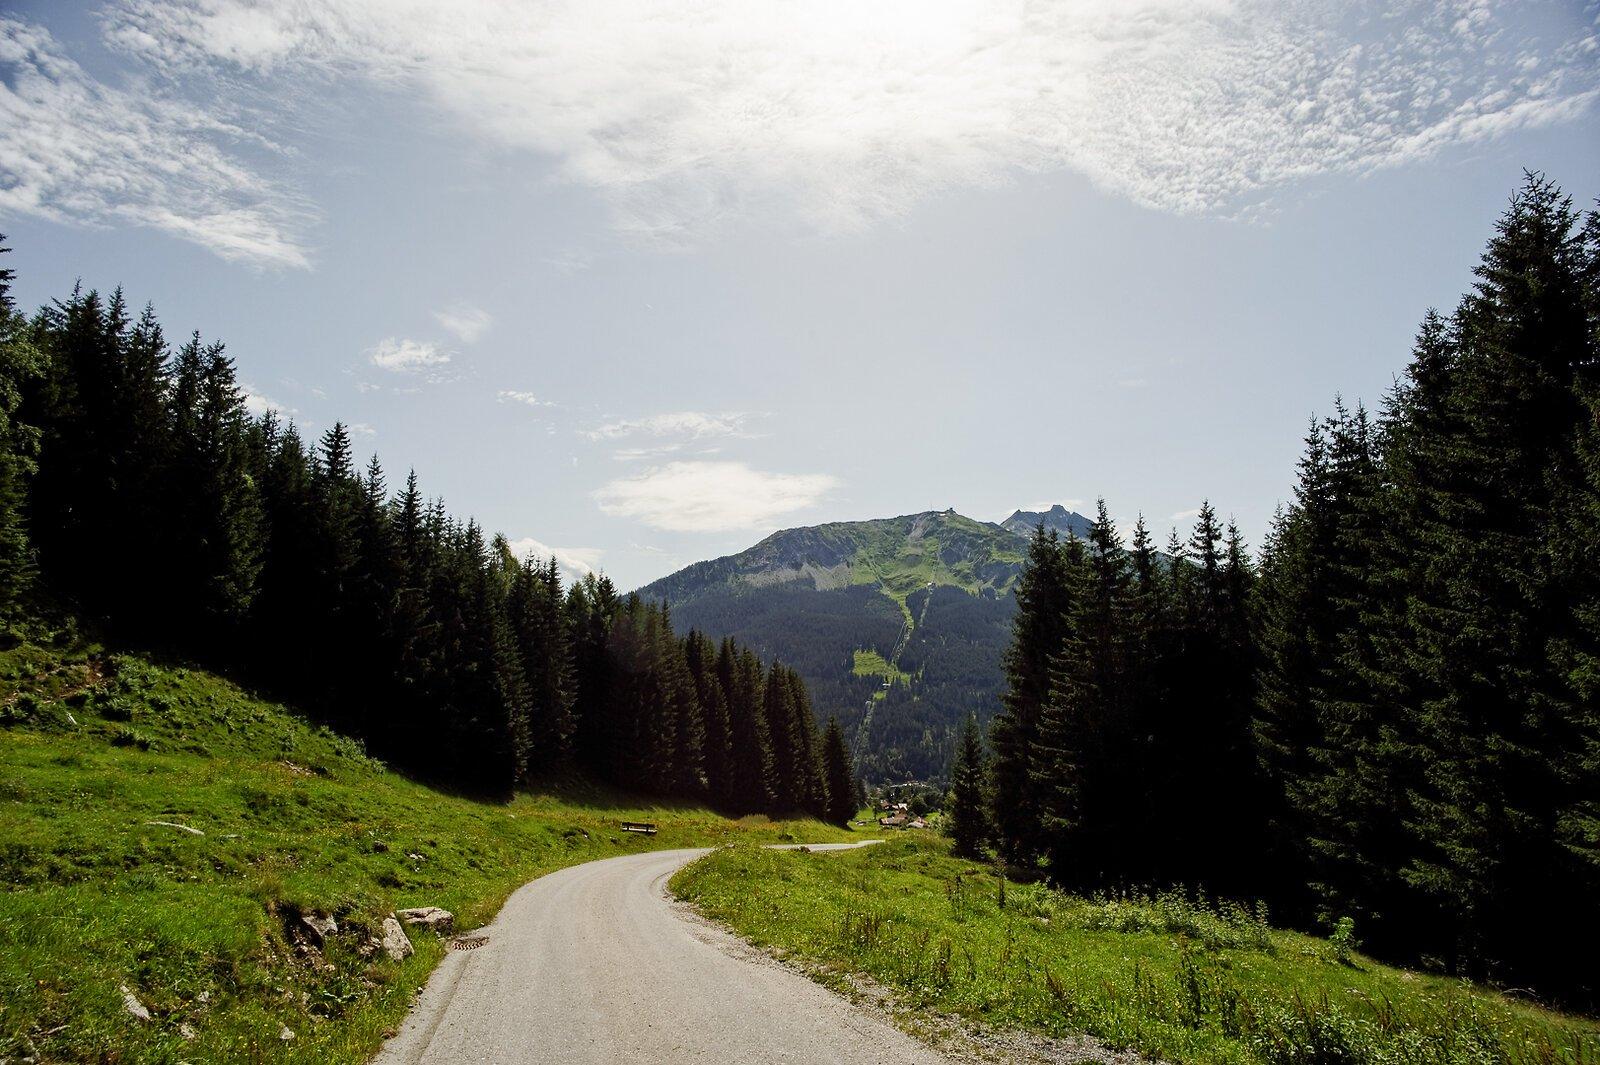 2012-Klosters_2012-07-18_15-48-59_01642_DxO.jpg